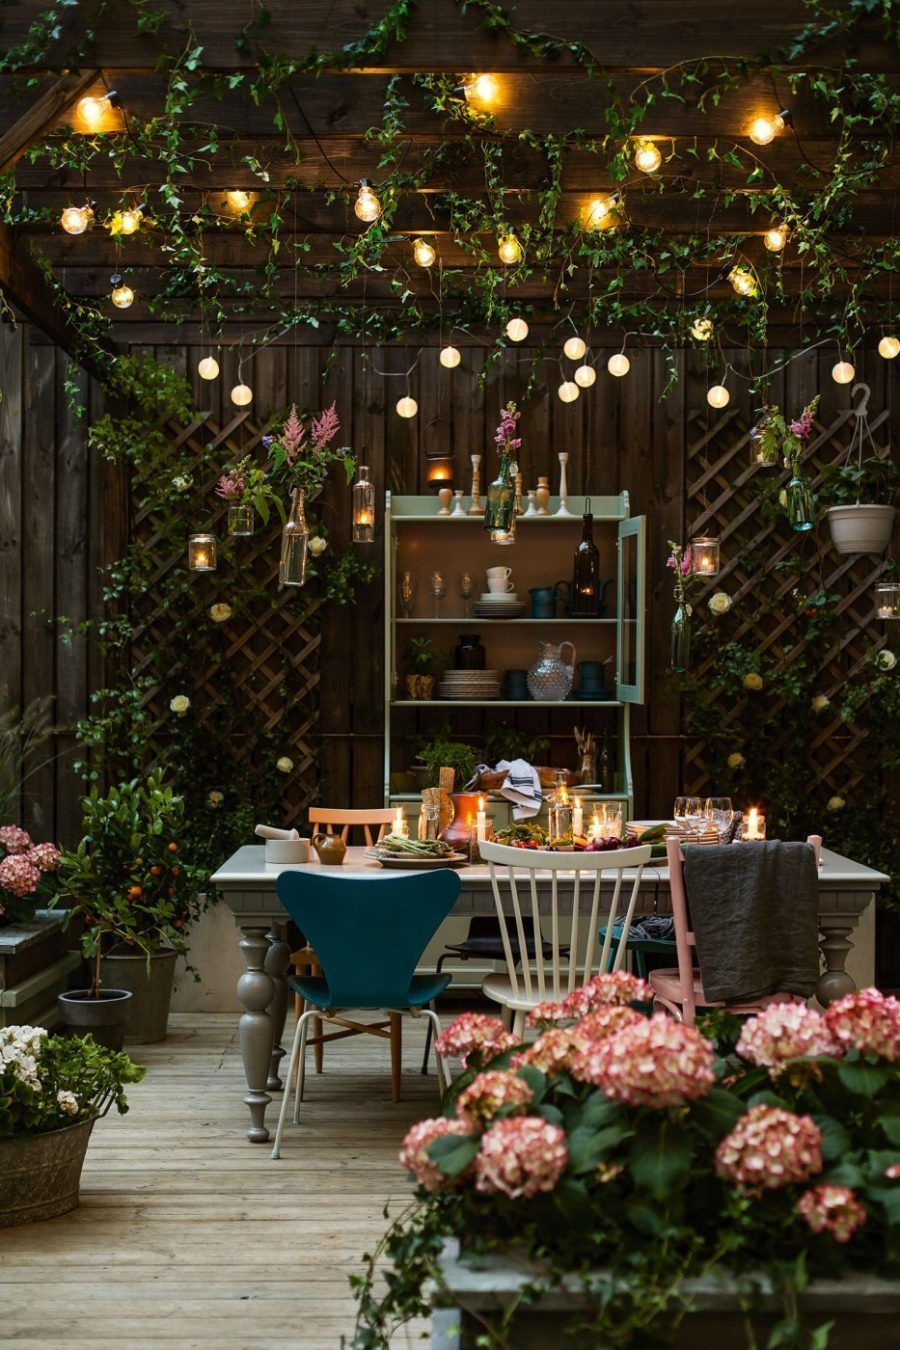 outdoor lighting ideas for patios. 17+ Backyard Lighting Ideas : Best For Wonderful Outdoor Patios I